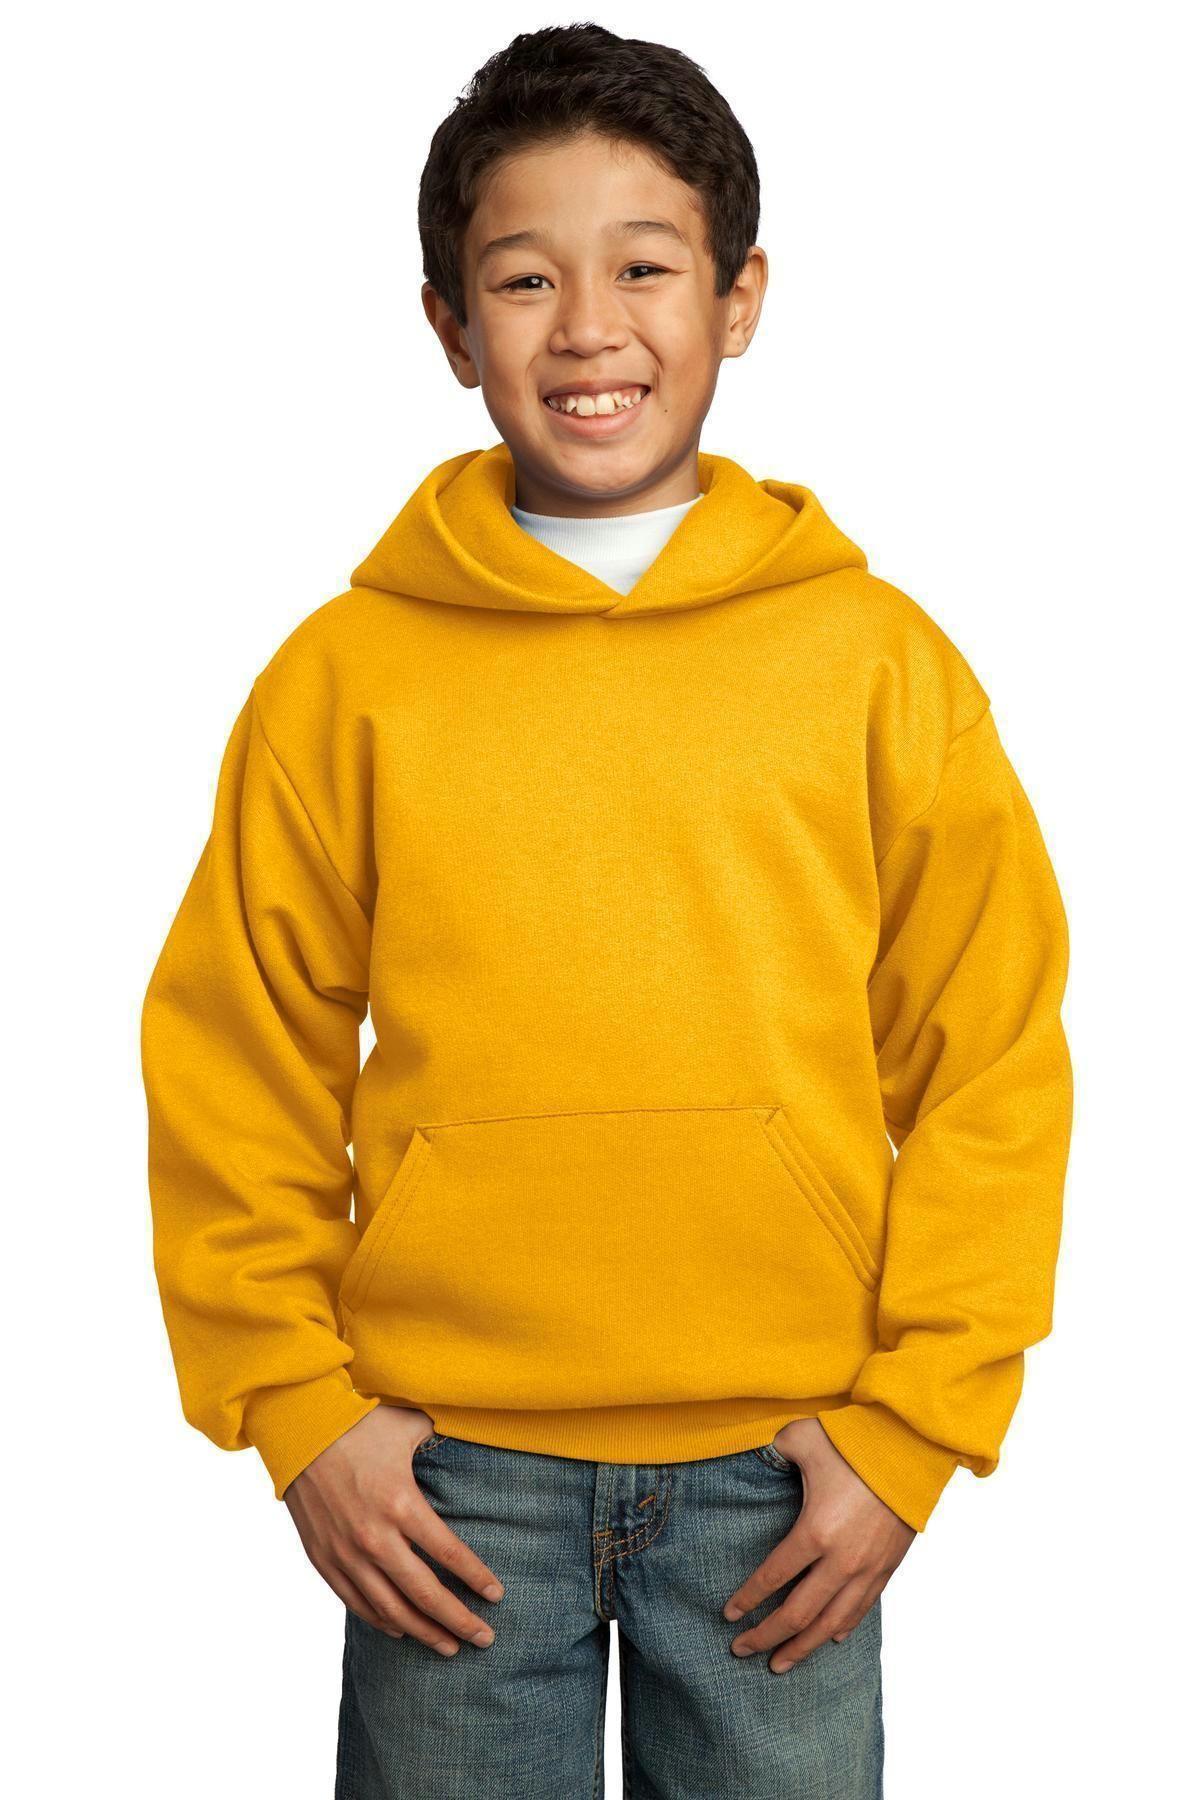 Small Youth Gildan Heavyweight Blend Hooded Sweatshirt in Carolina Blue 6//8